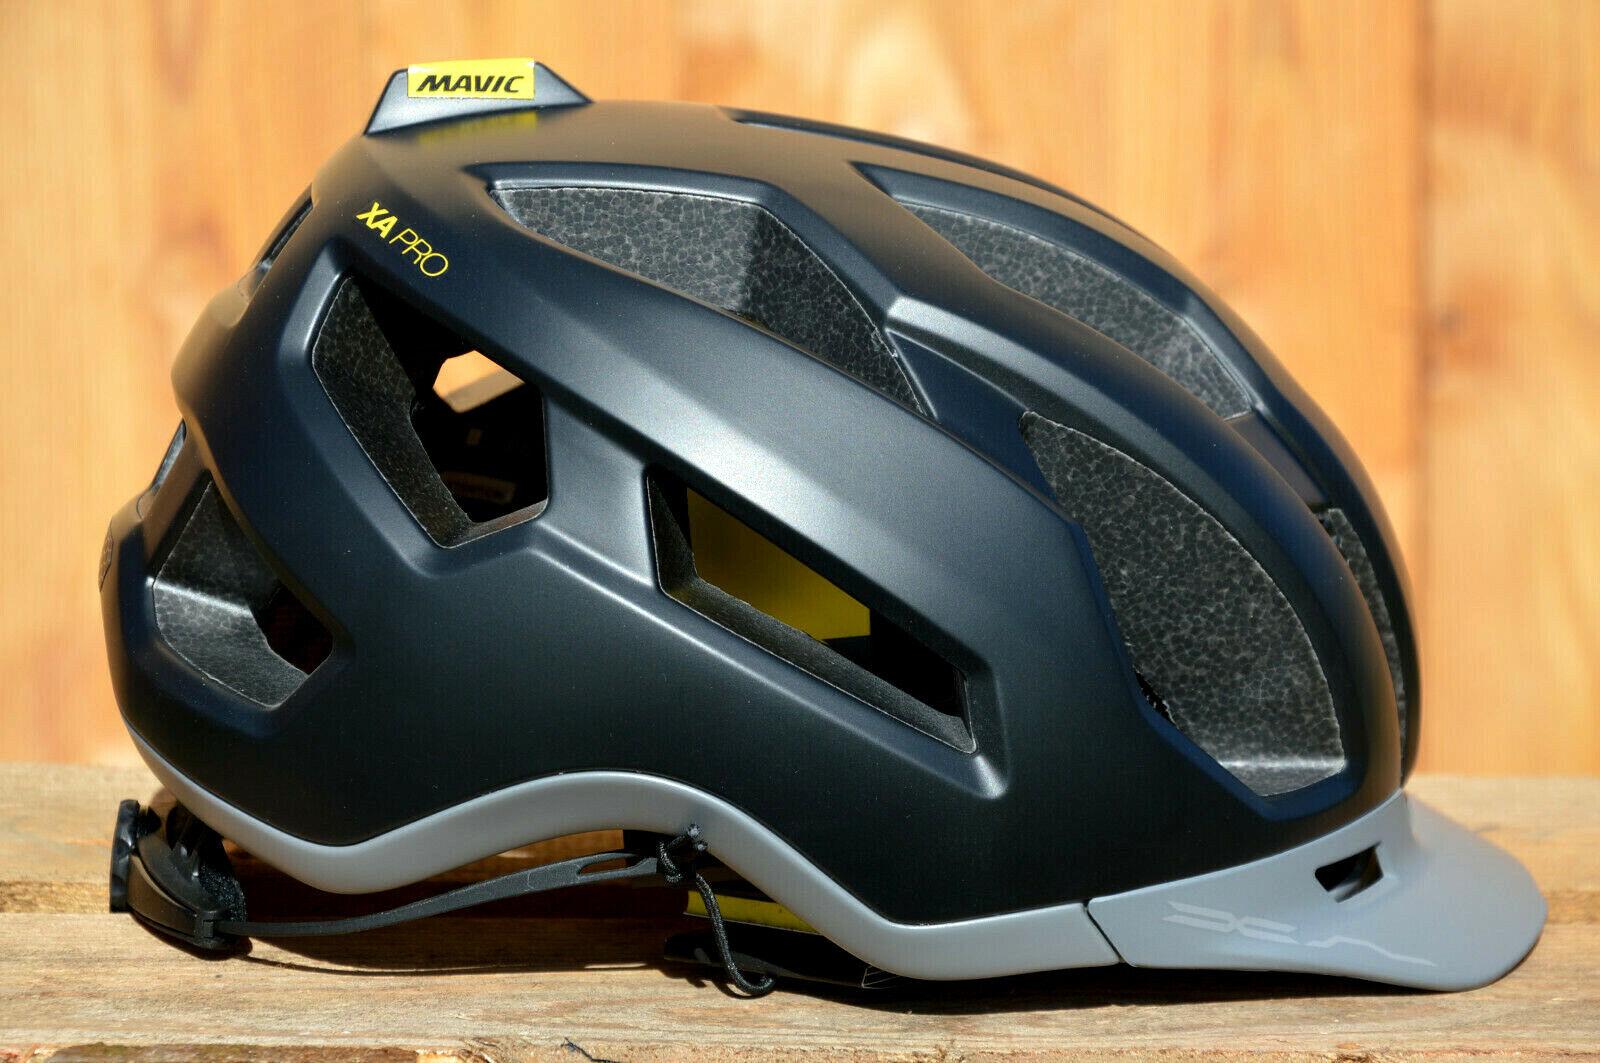 Mavic Xa Pro Vélo MTB Sentier Casque Confortable Siège Bonne Aération black Neuf